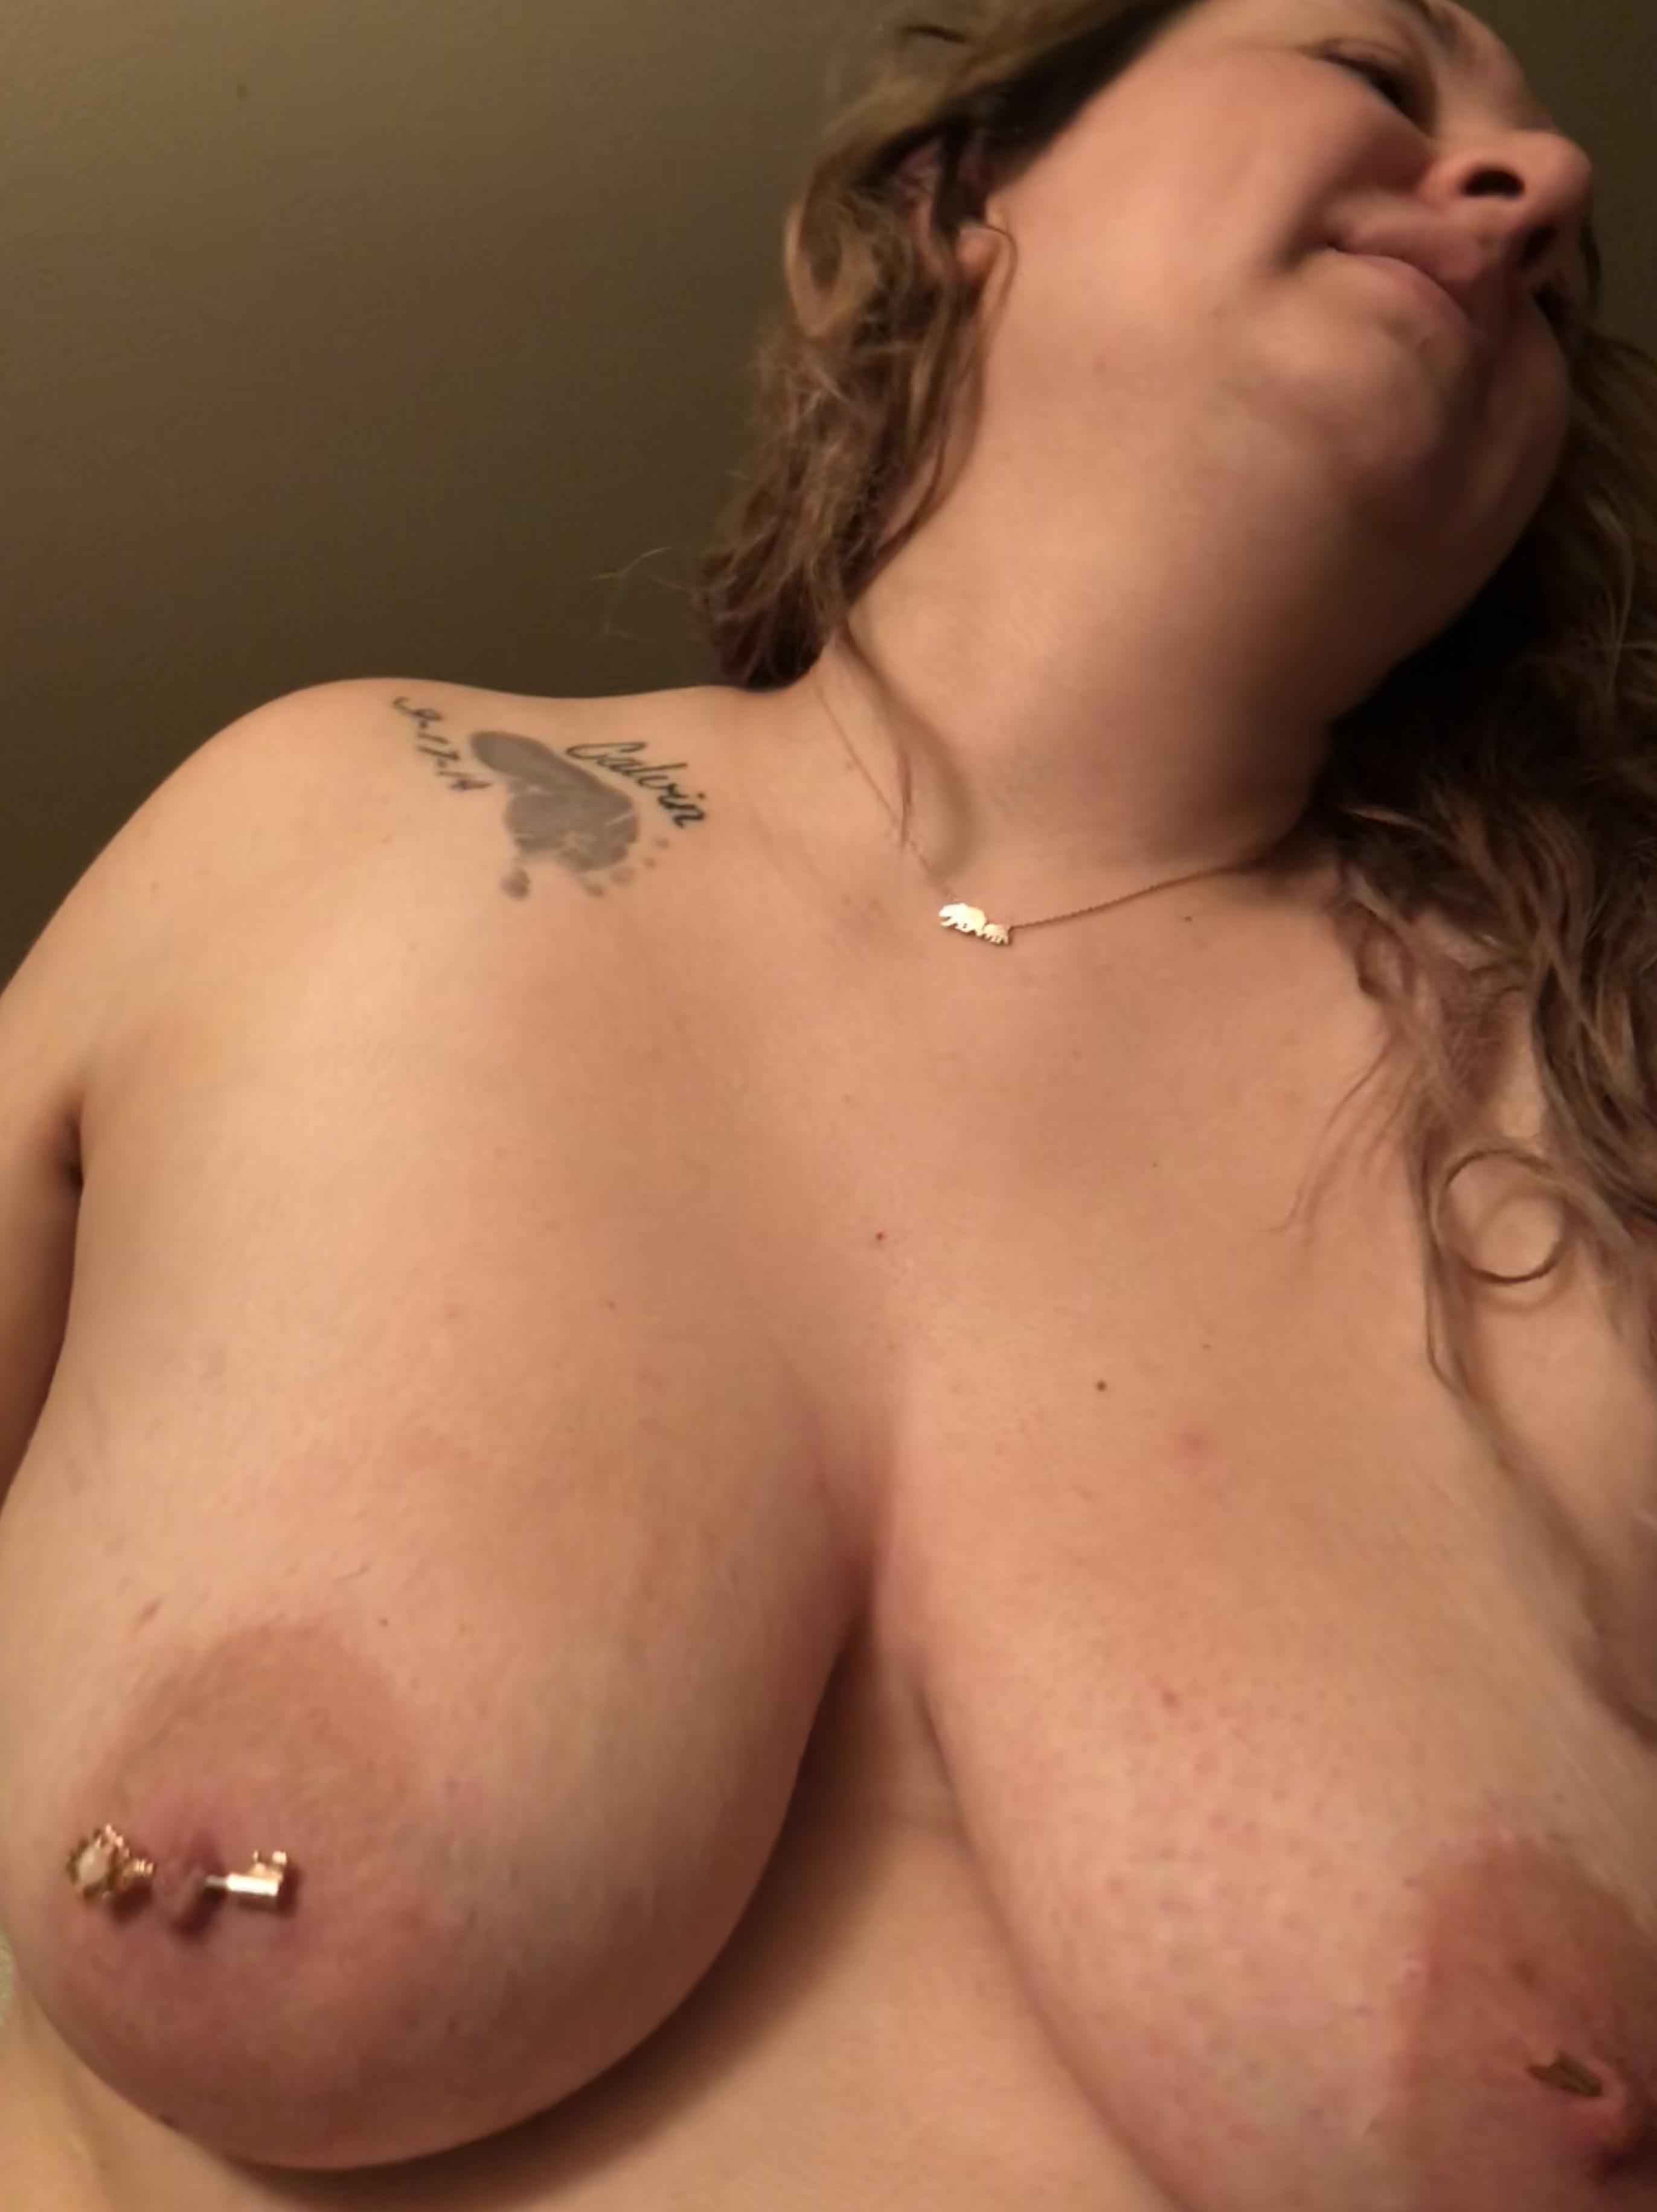 Oc Me Riding His Cock Porn Pic Eporner